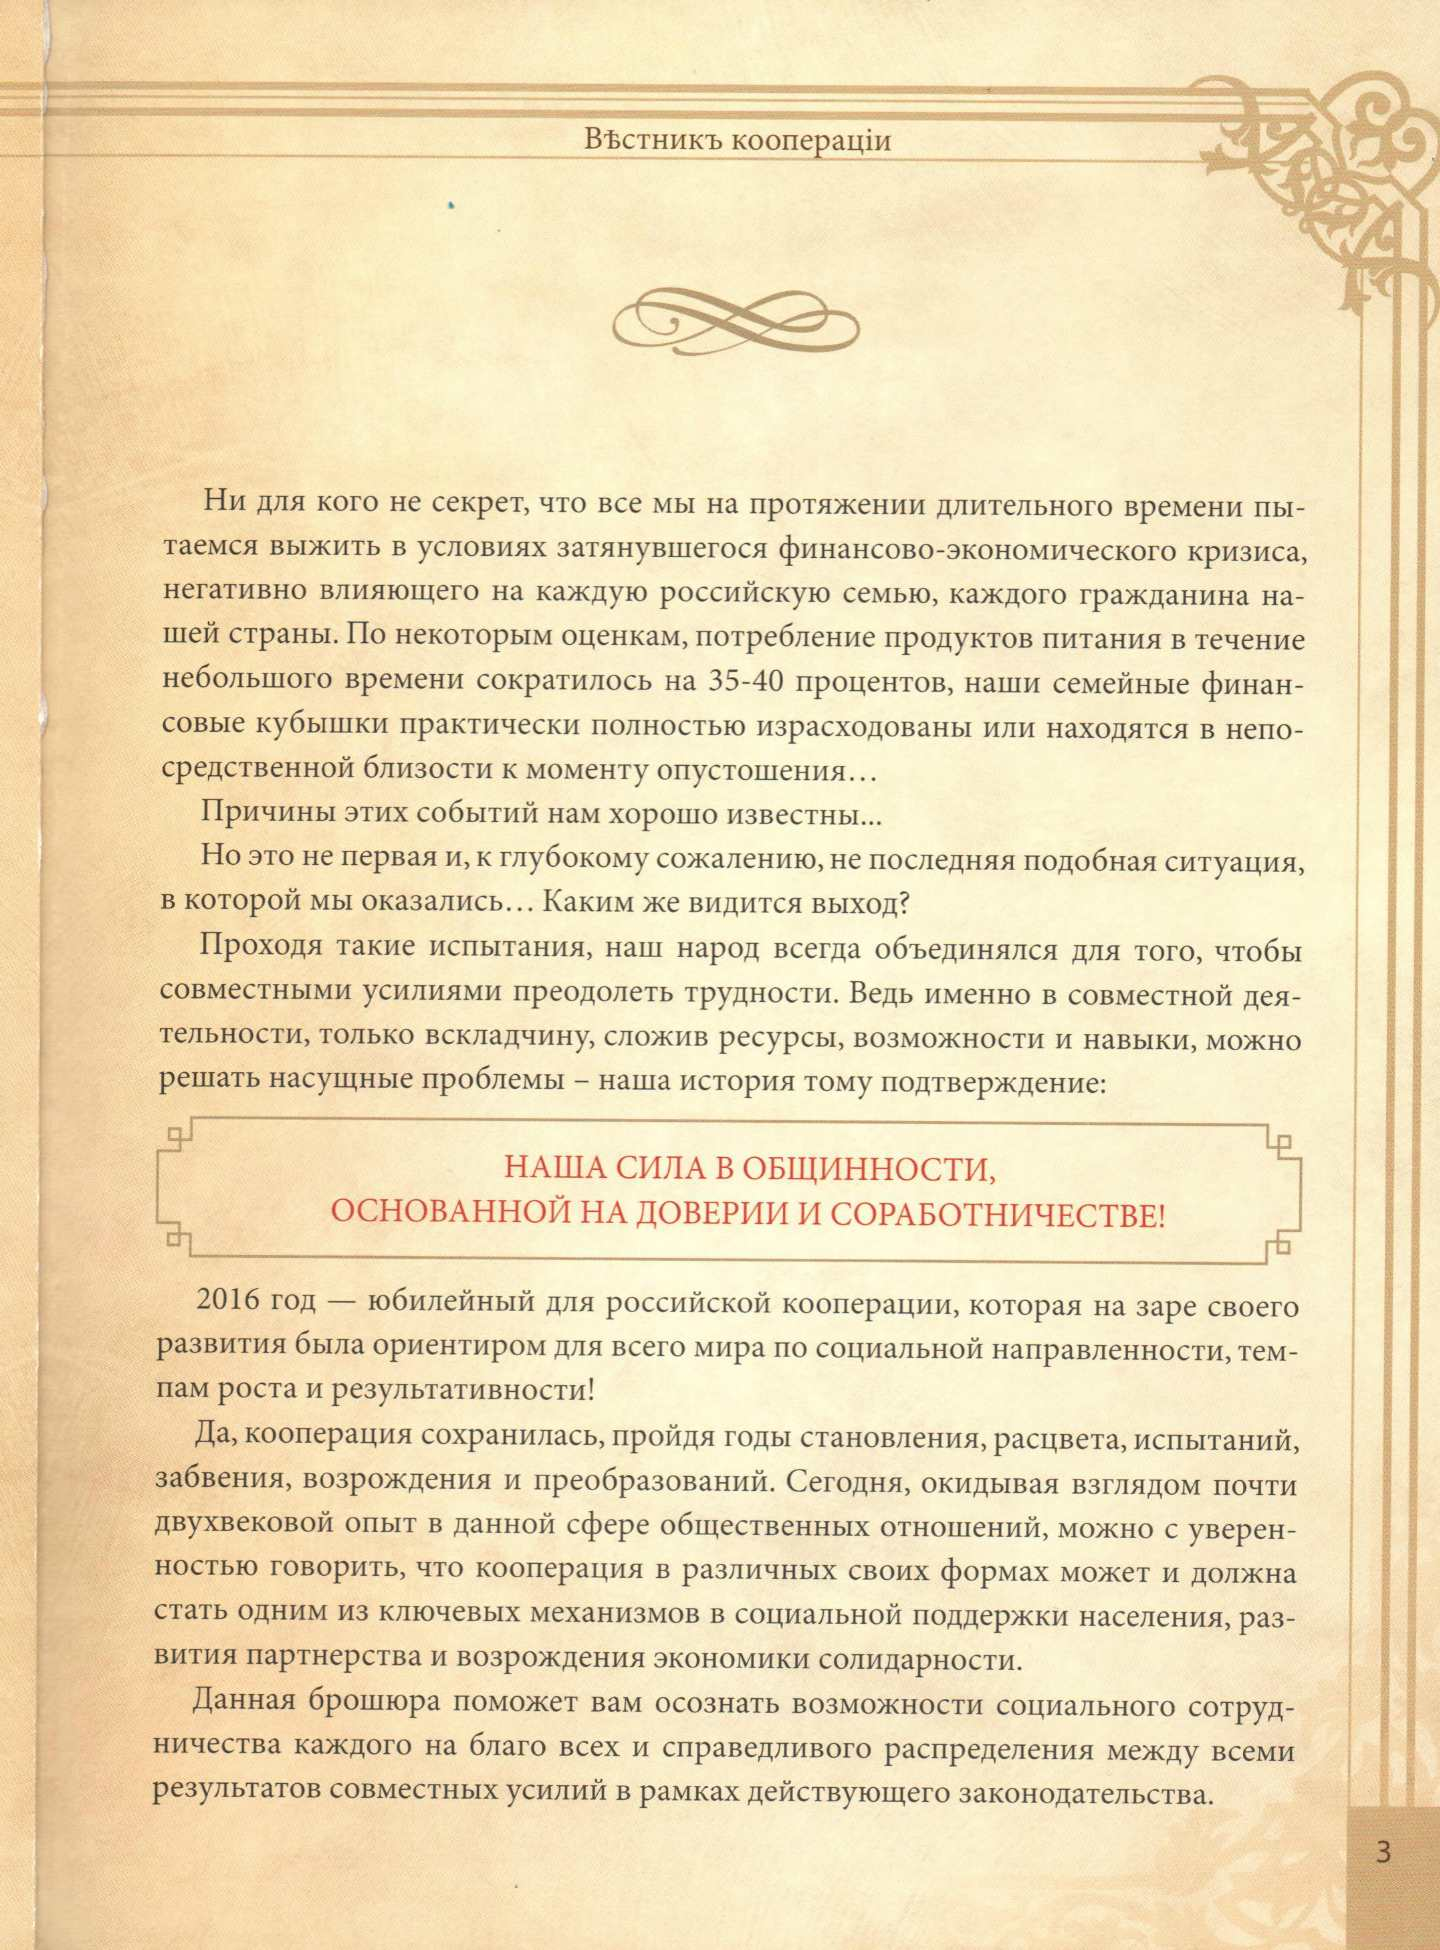 Вестник кооперации-3